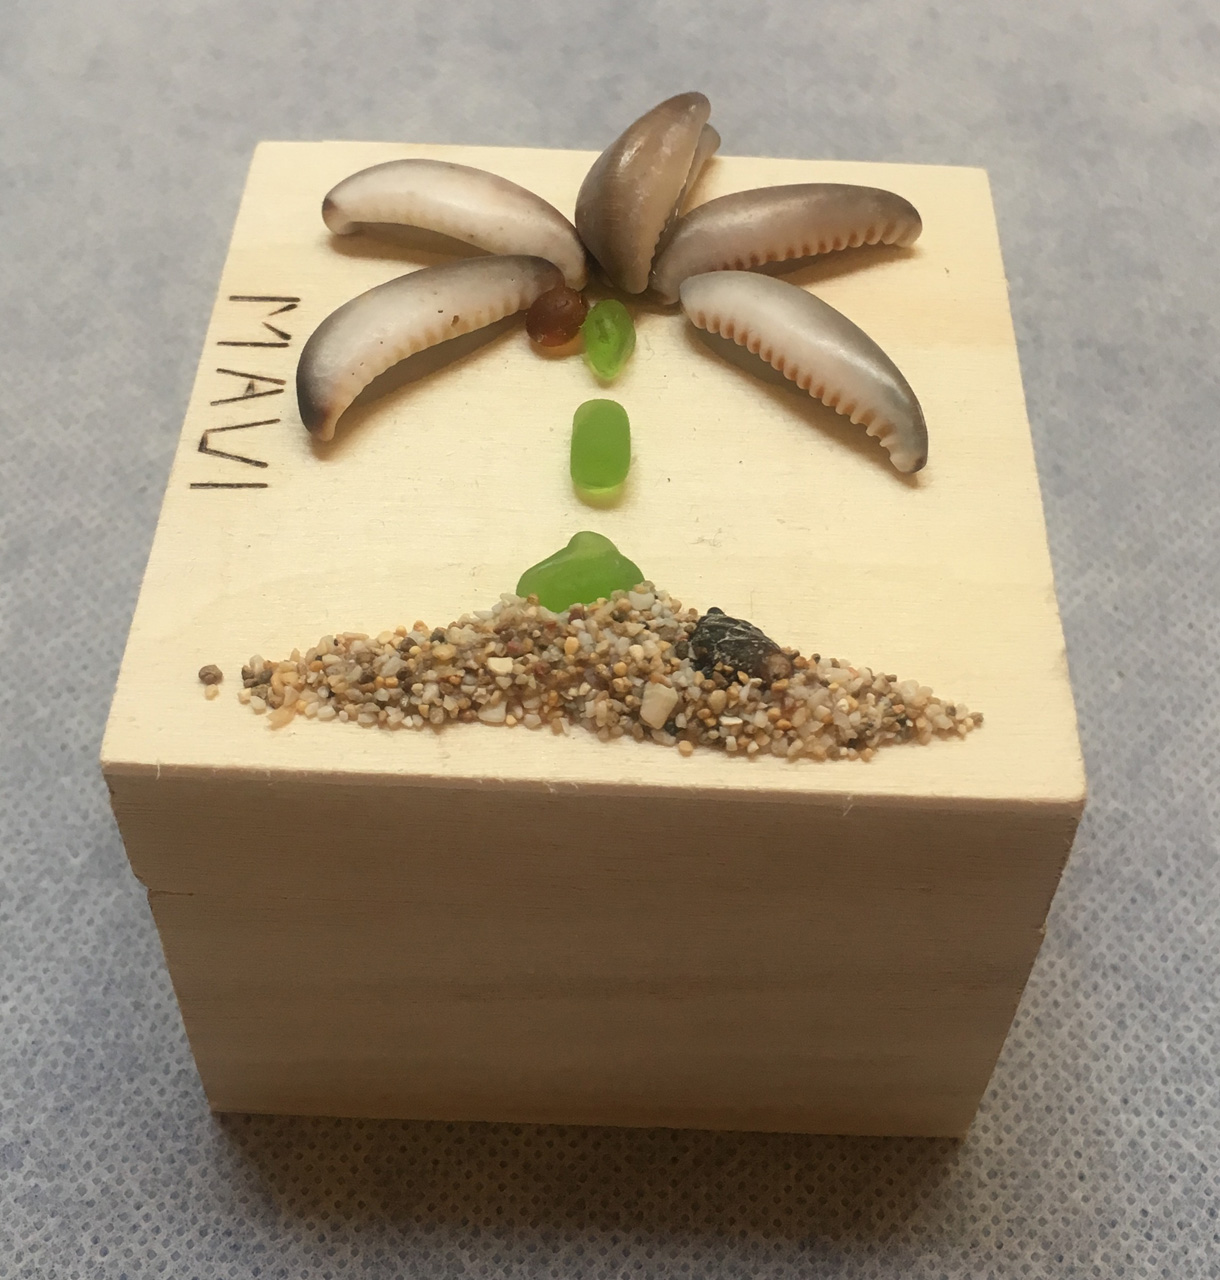 Beach Treasure Palm Square Box by Richard Jordan